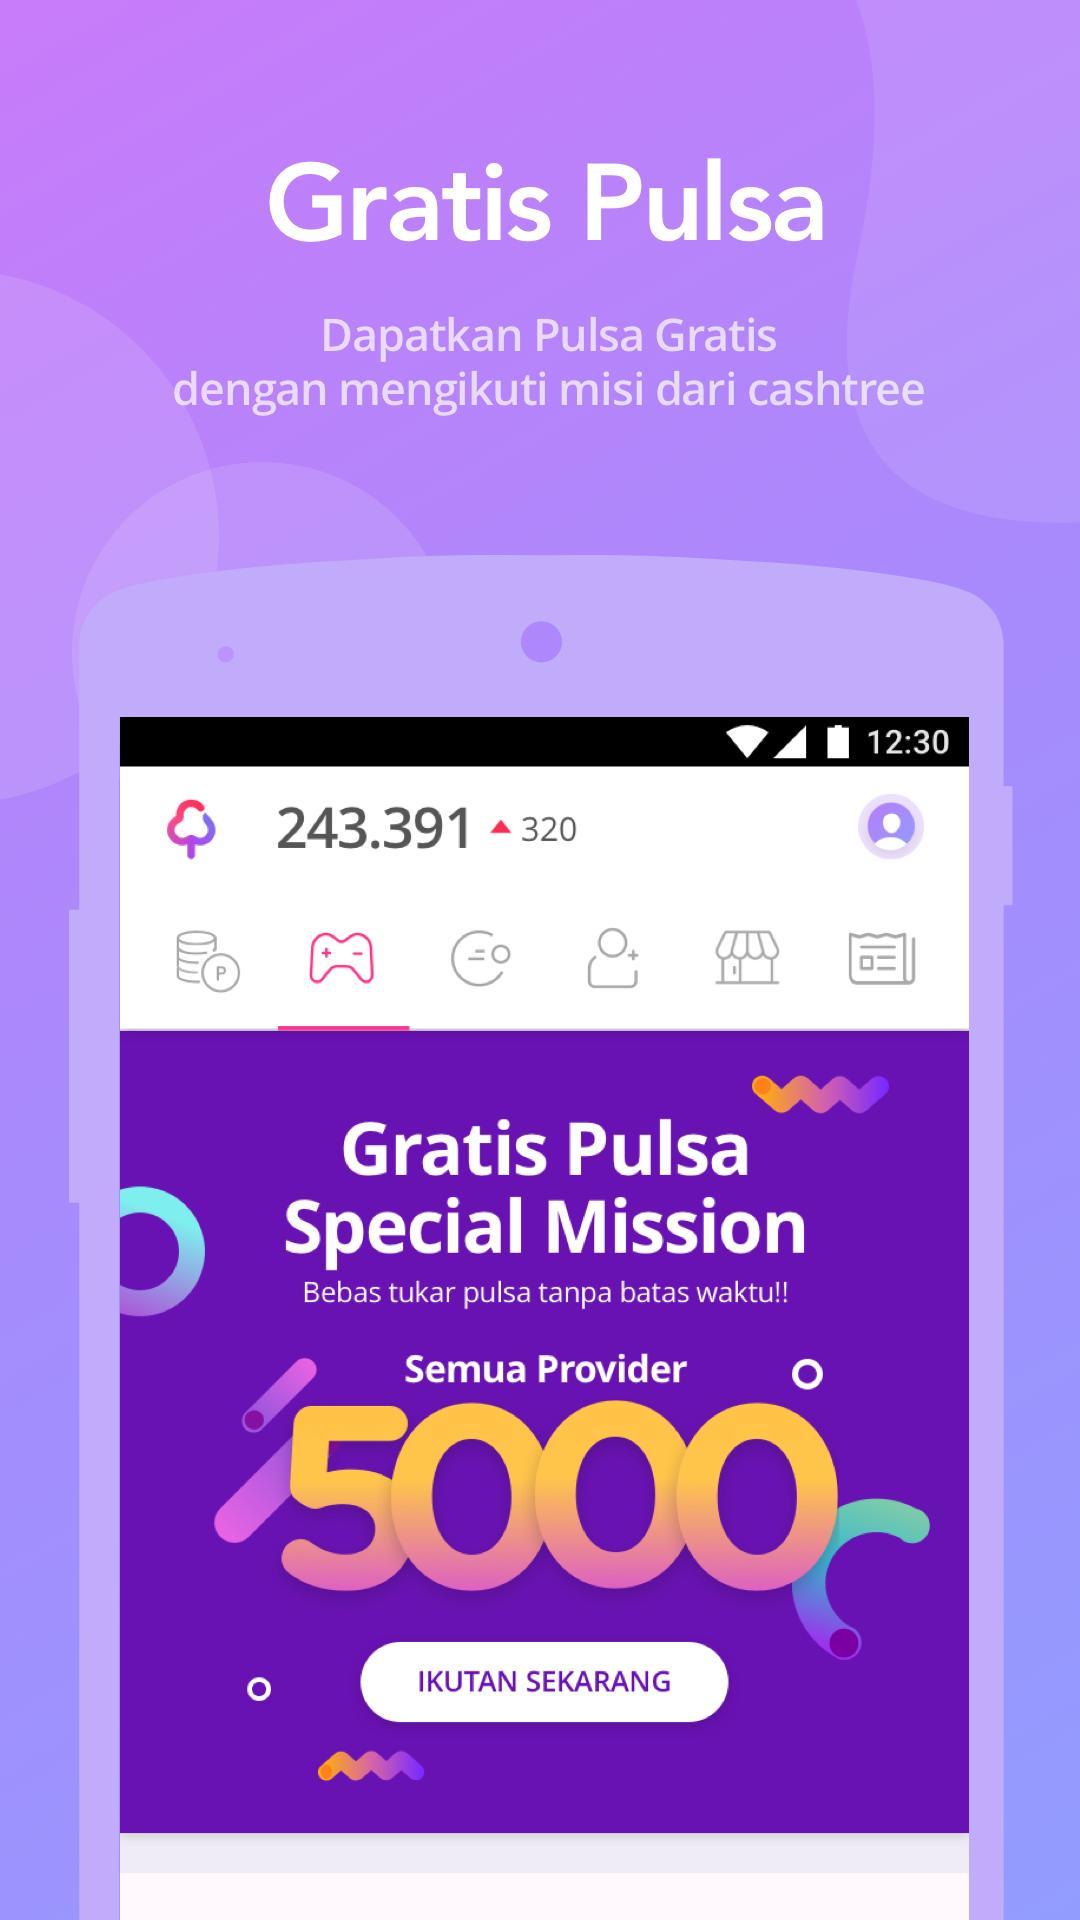 aplikasi gratis pulsa